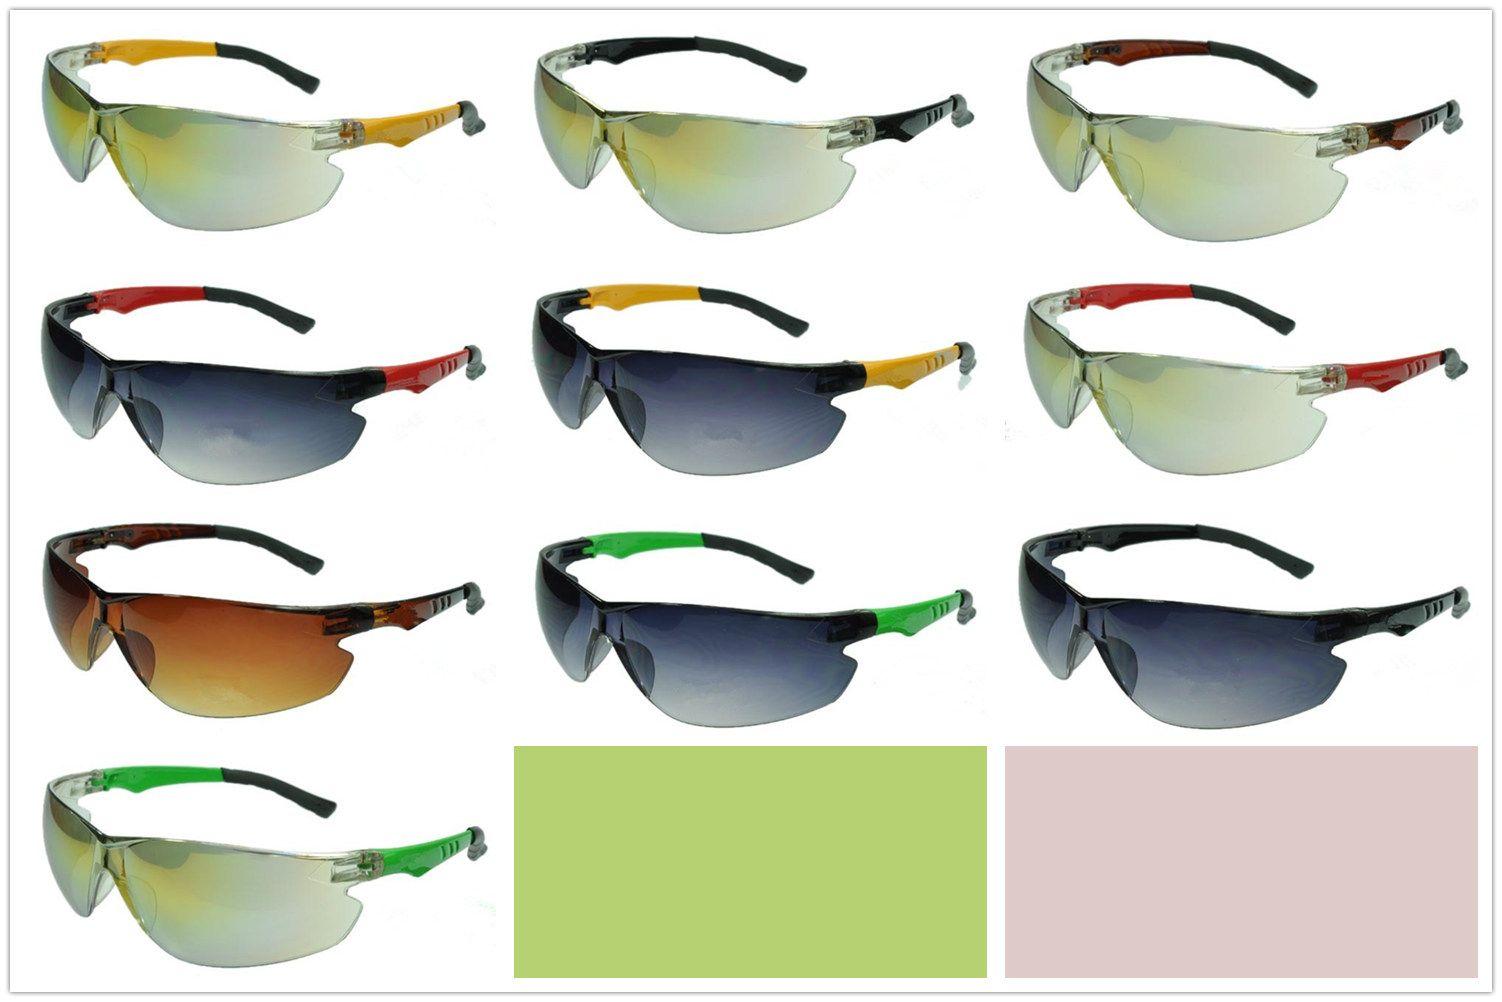 2018 Brand Designer Racing sports sunglasses For Men Women Wholesale Outdoor sports goggles bike fishing Driving sunglasses drop shippin